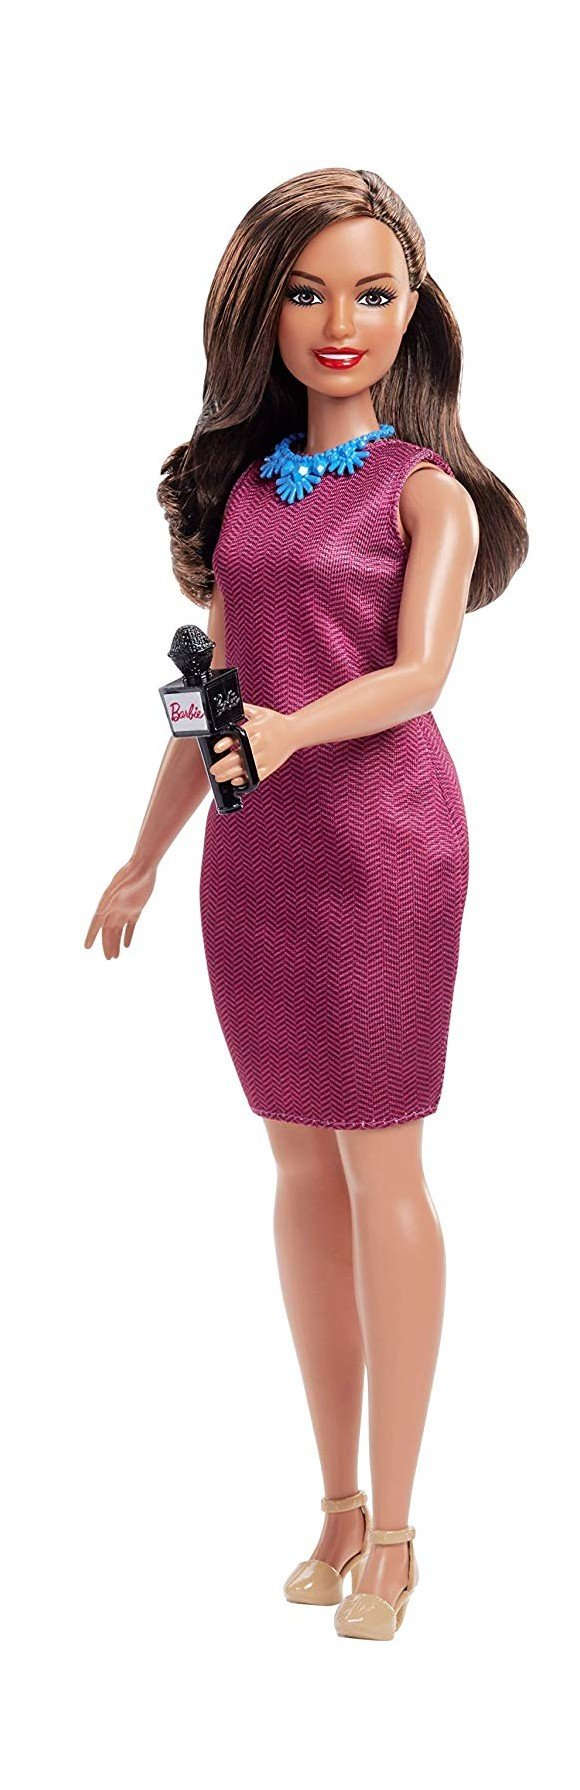 Barbie - Storytelling Pack - Journalist (GFX27)